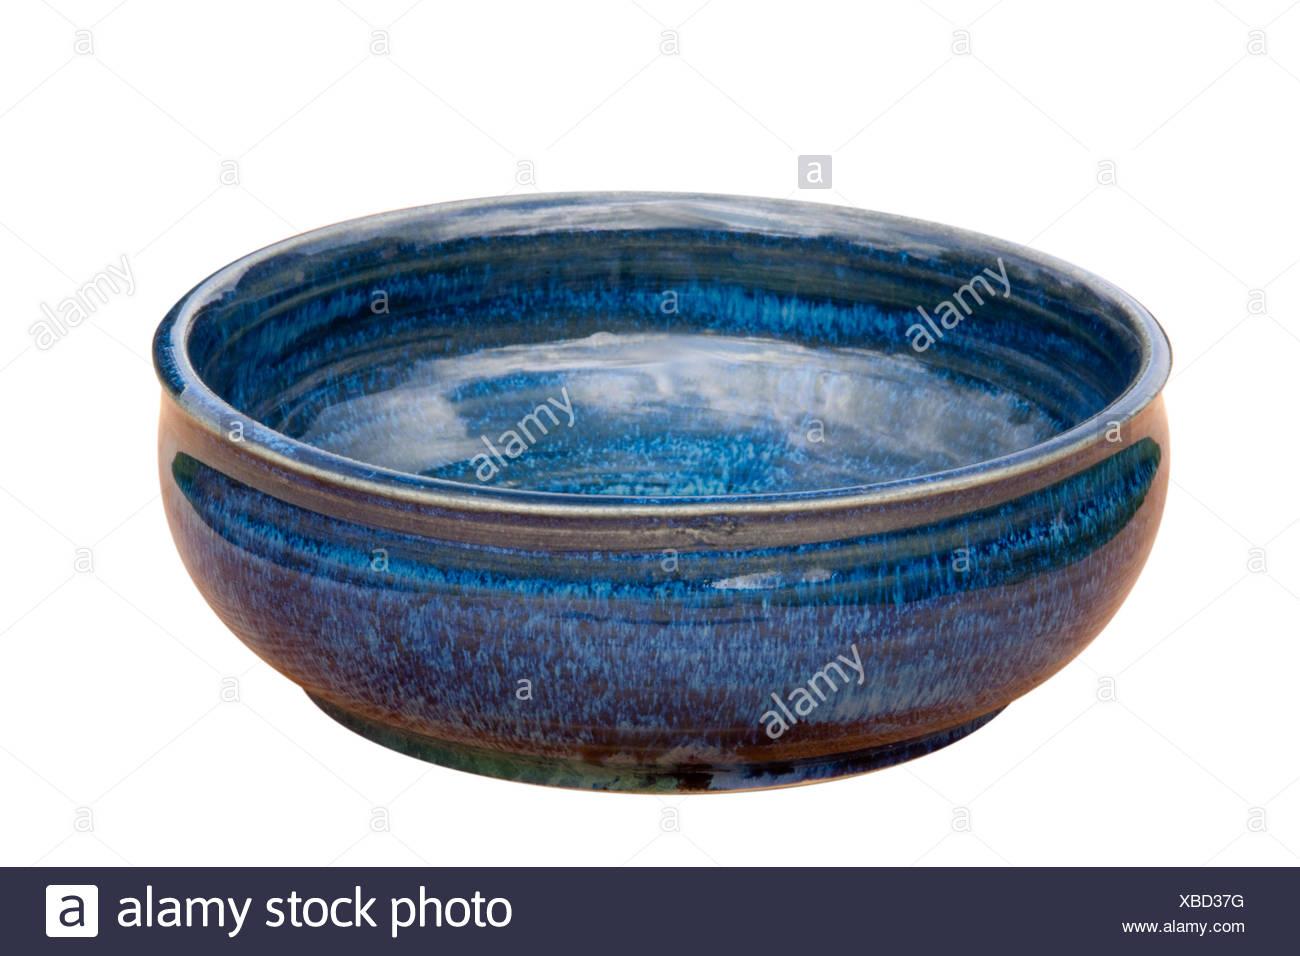 Steingut Keramik schale kunst handwerk ton glasur blau keramik steingut stock photos